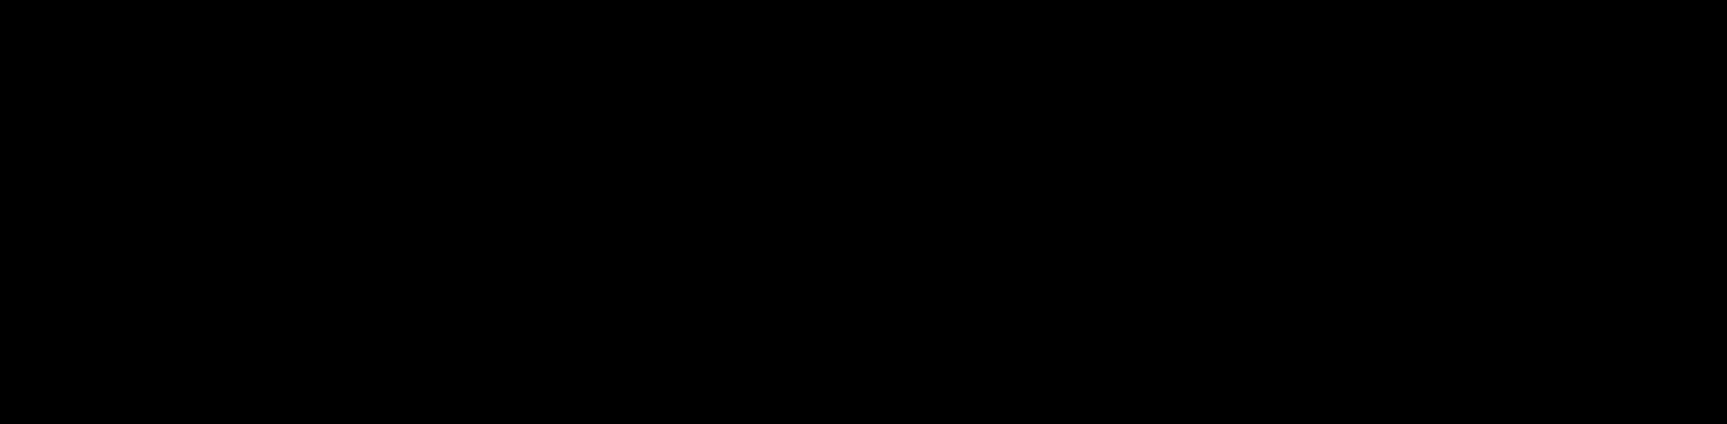 Img 1065